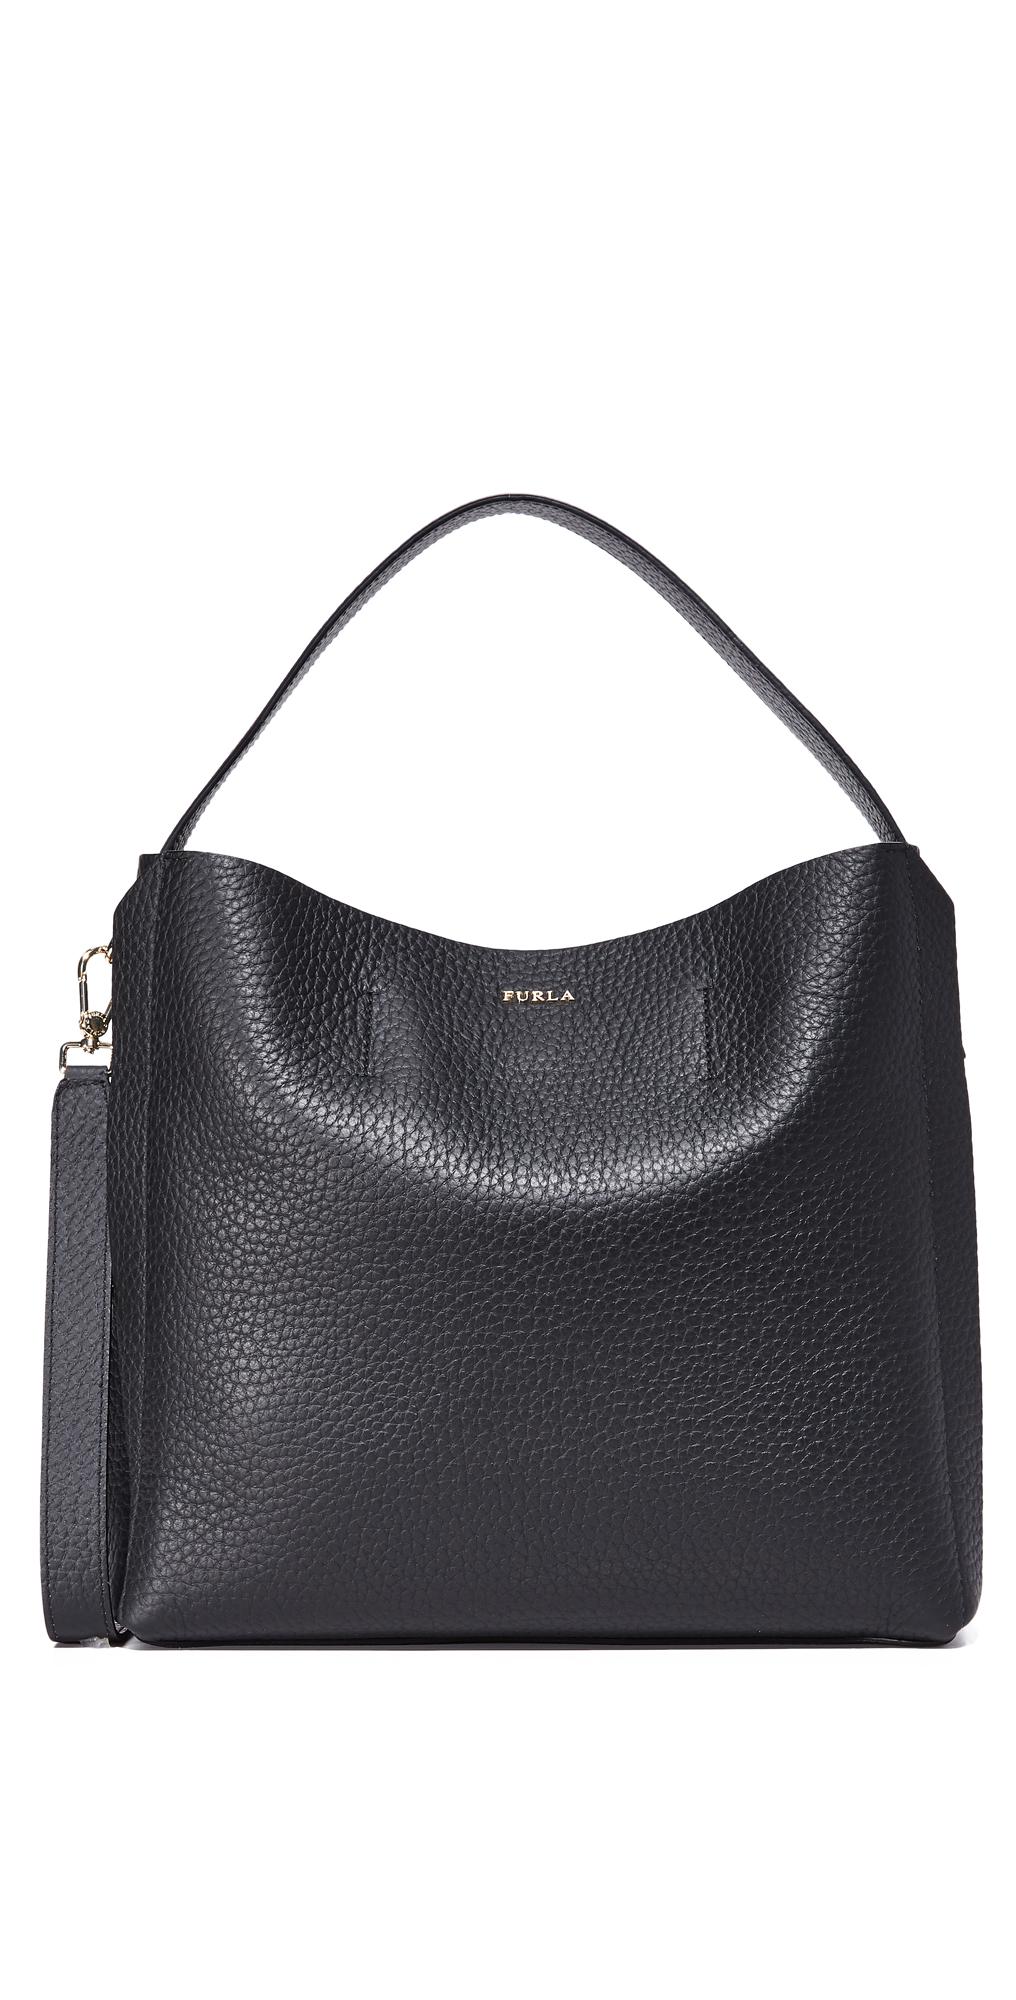 Capriccio Medium Hobo Bag Furla